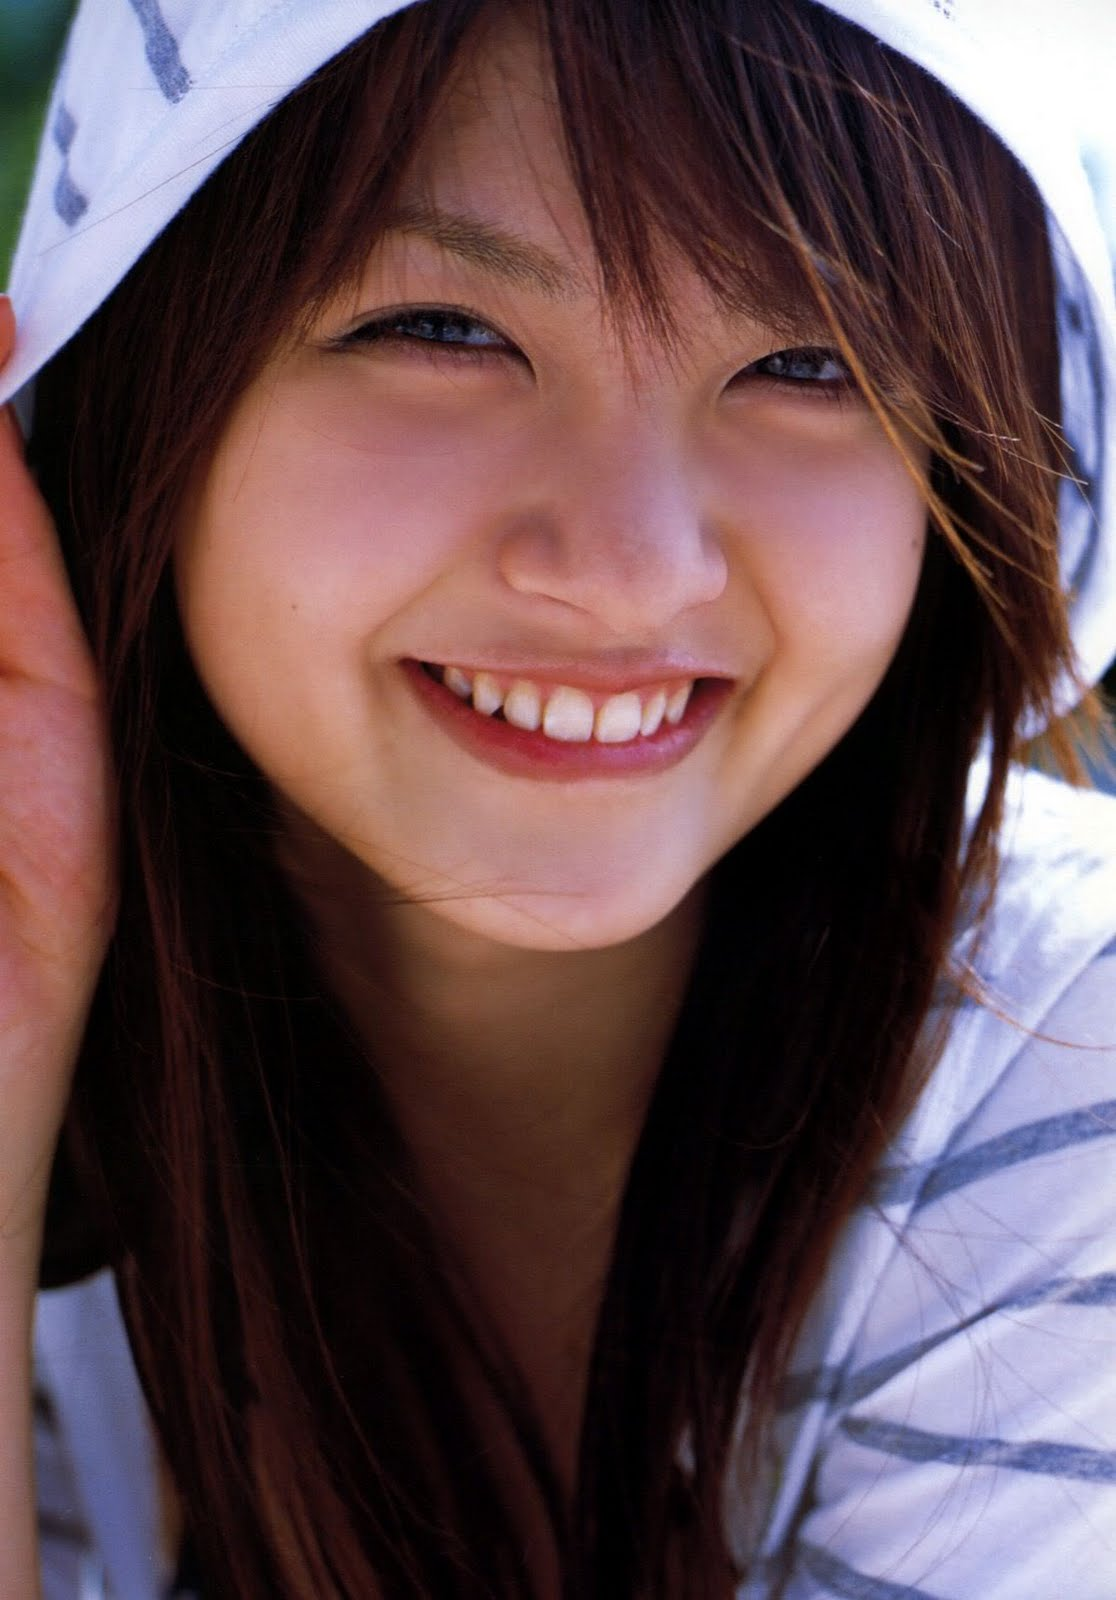 http://1.bp.blogspot.com/_Y0mv5q_w5qs/TN-nq6ksp3I/AAAAAAAABSI/1AtLUWOTYkM/s1600/Asuka_Hinoi6.jpg